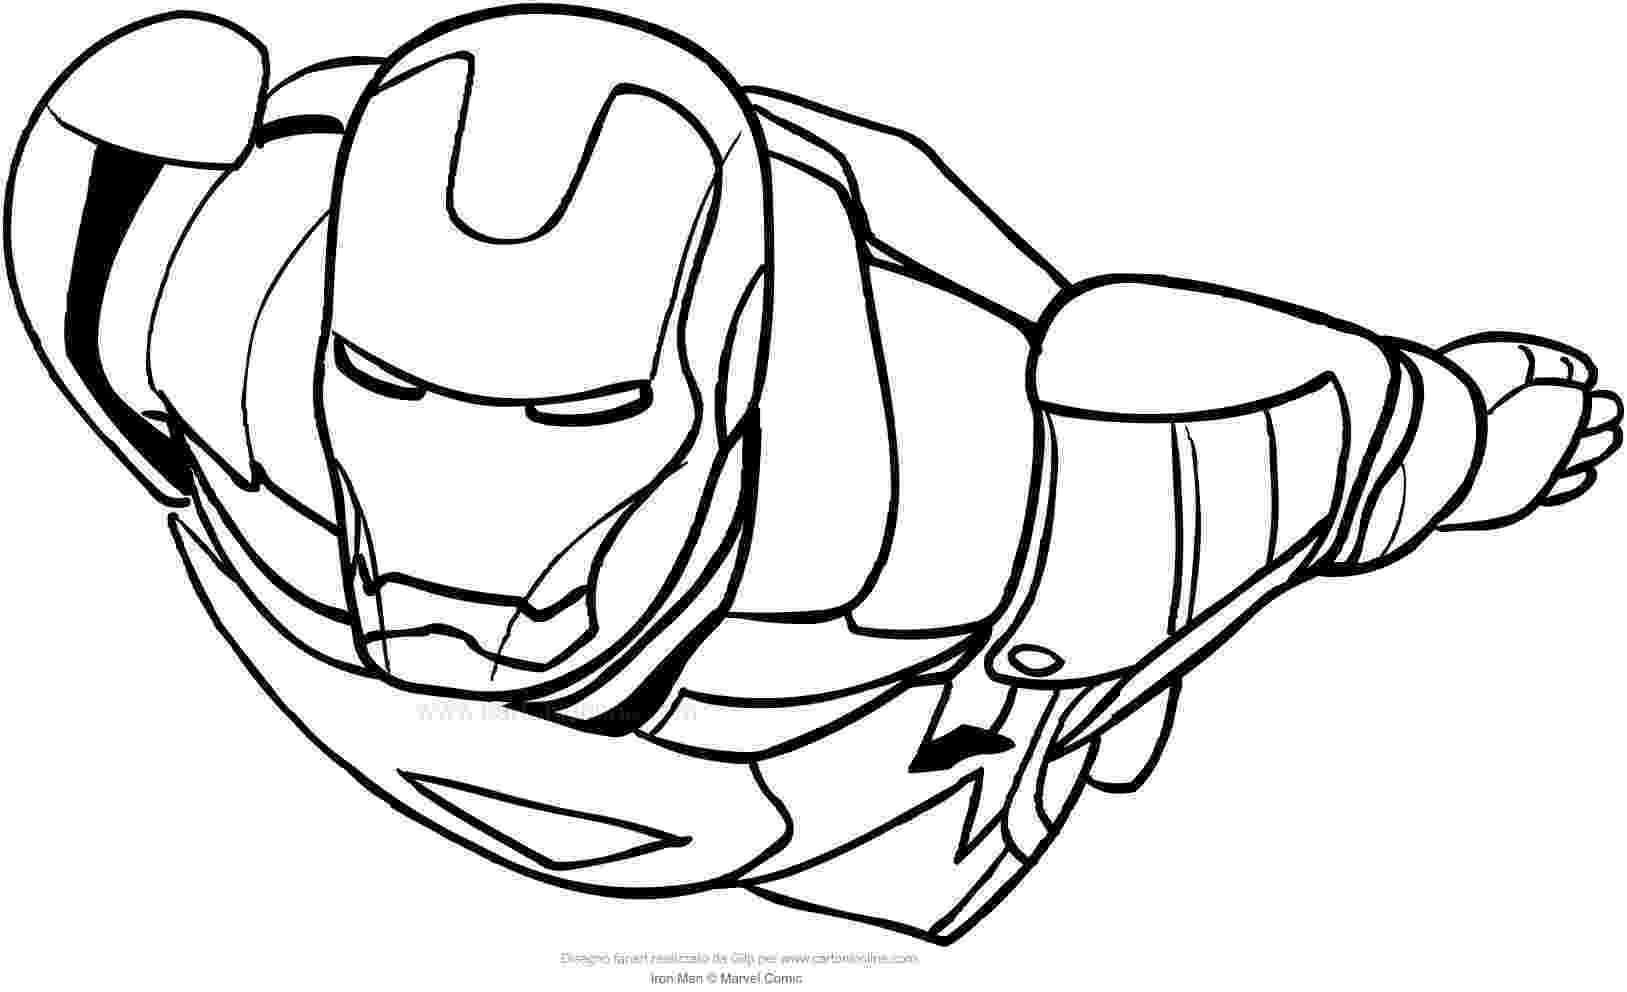 imagenes de iron man para colorear iron man mask coloring pages getcoloringpagescom sketch colorear iron imagenes de para man